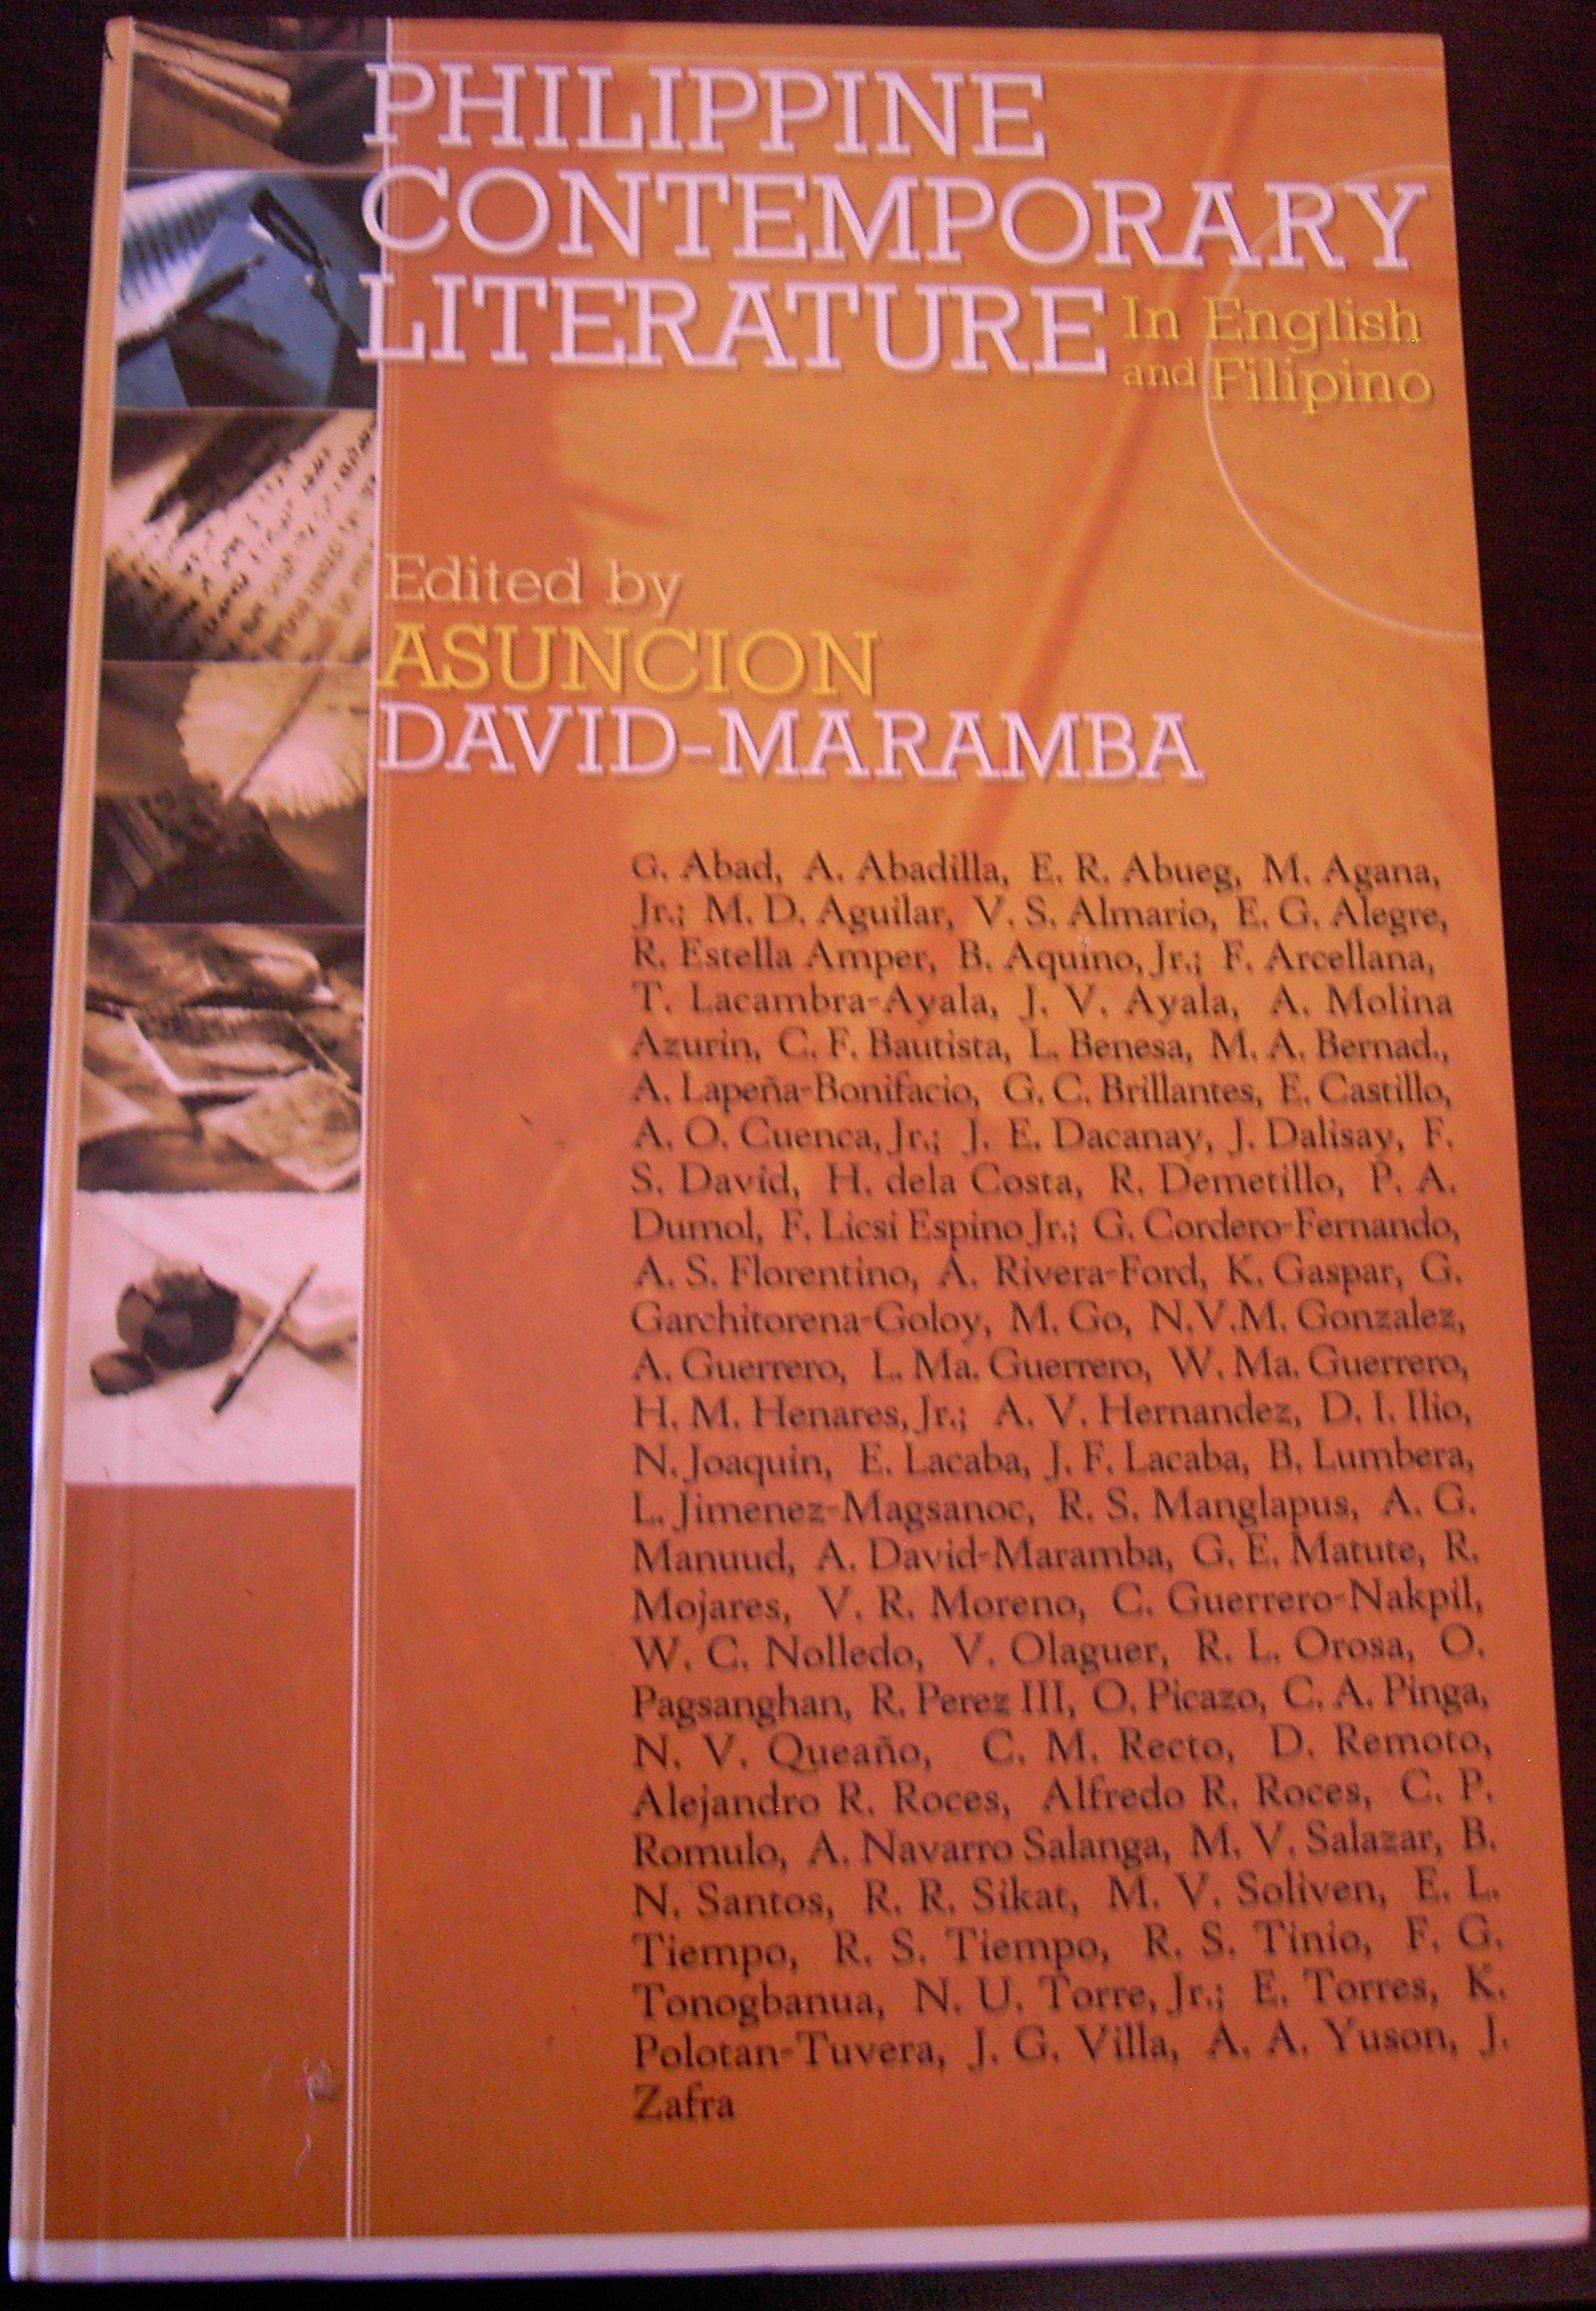 philippine literature in english